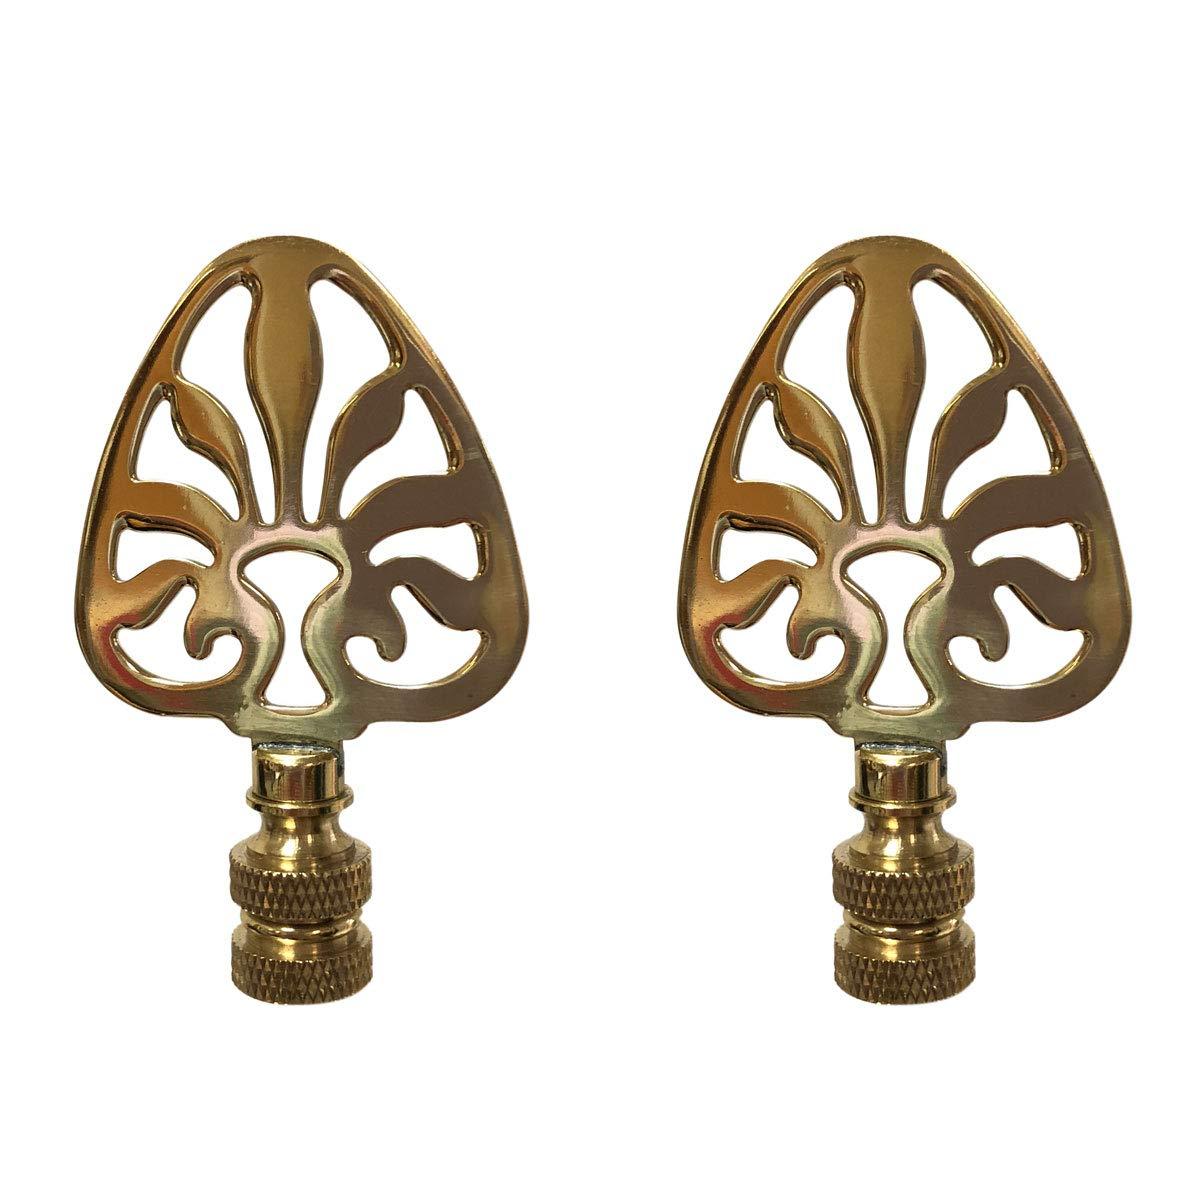 Royal Designs F-5063PB-2 Rising Sun Filigree Design Lamp Finial, Polished Brass, Set of 2